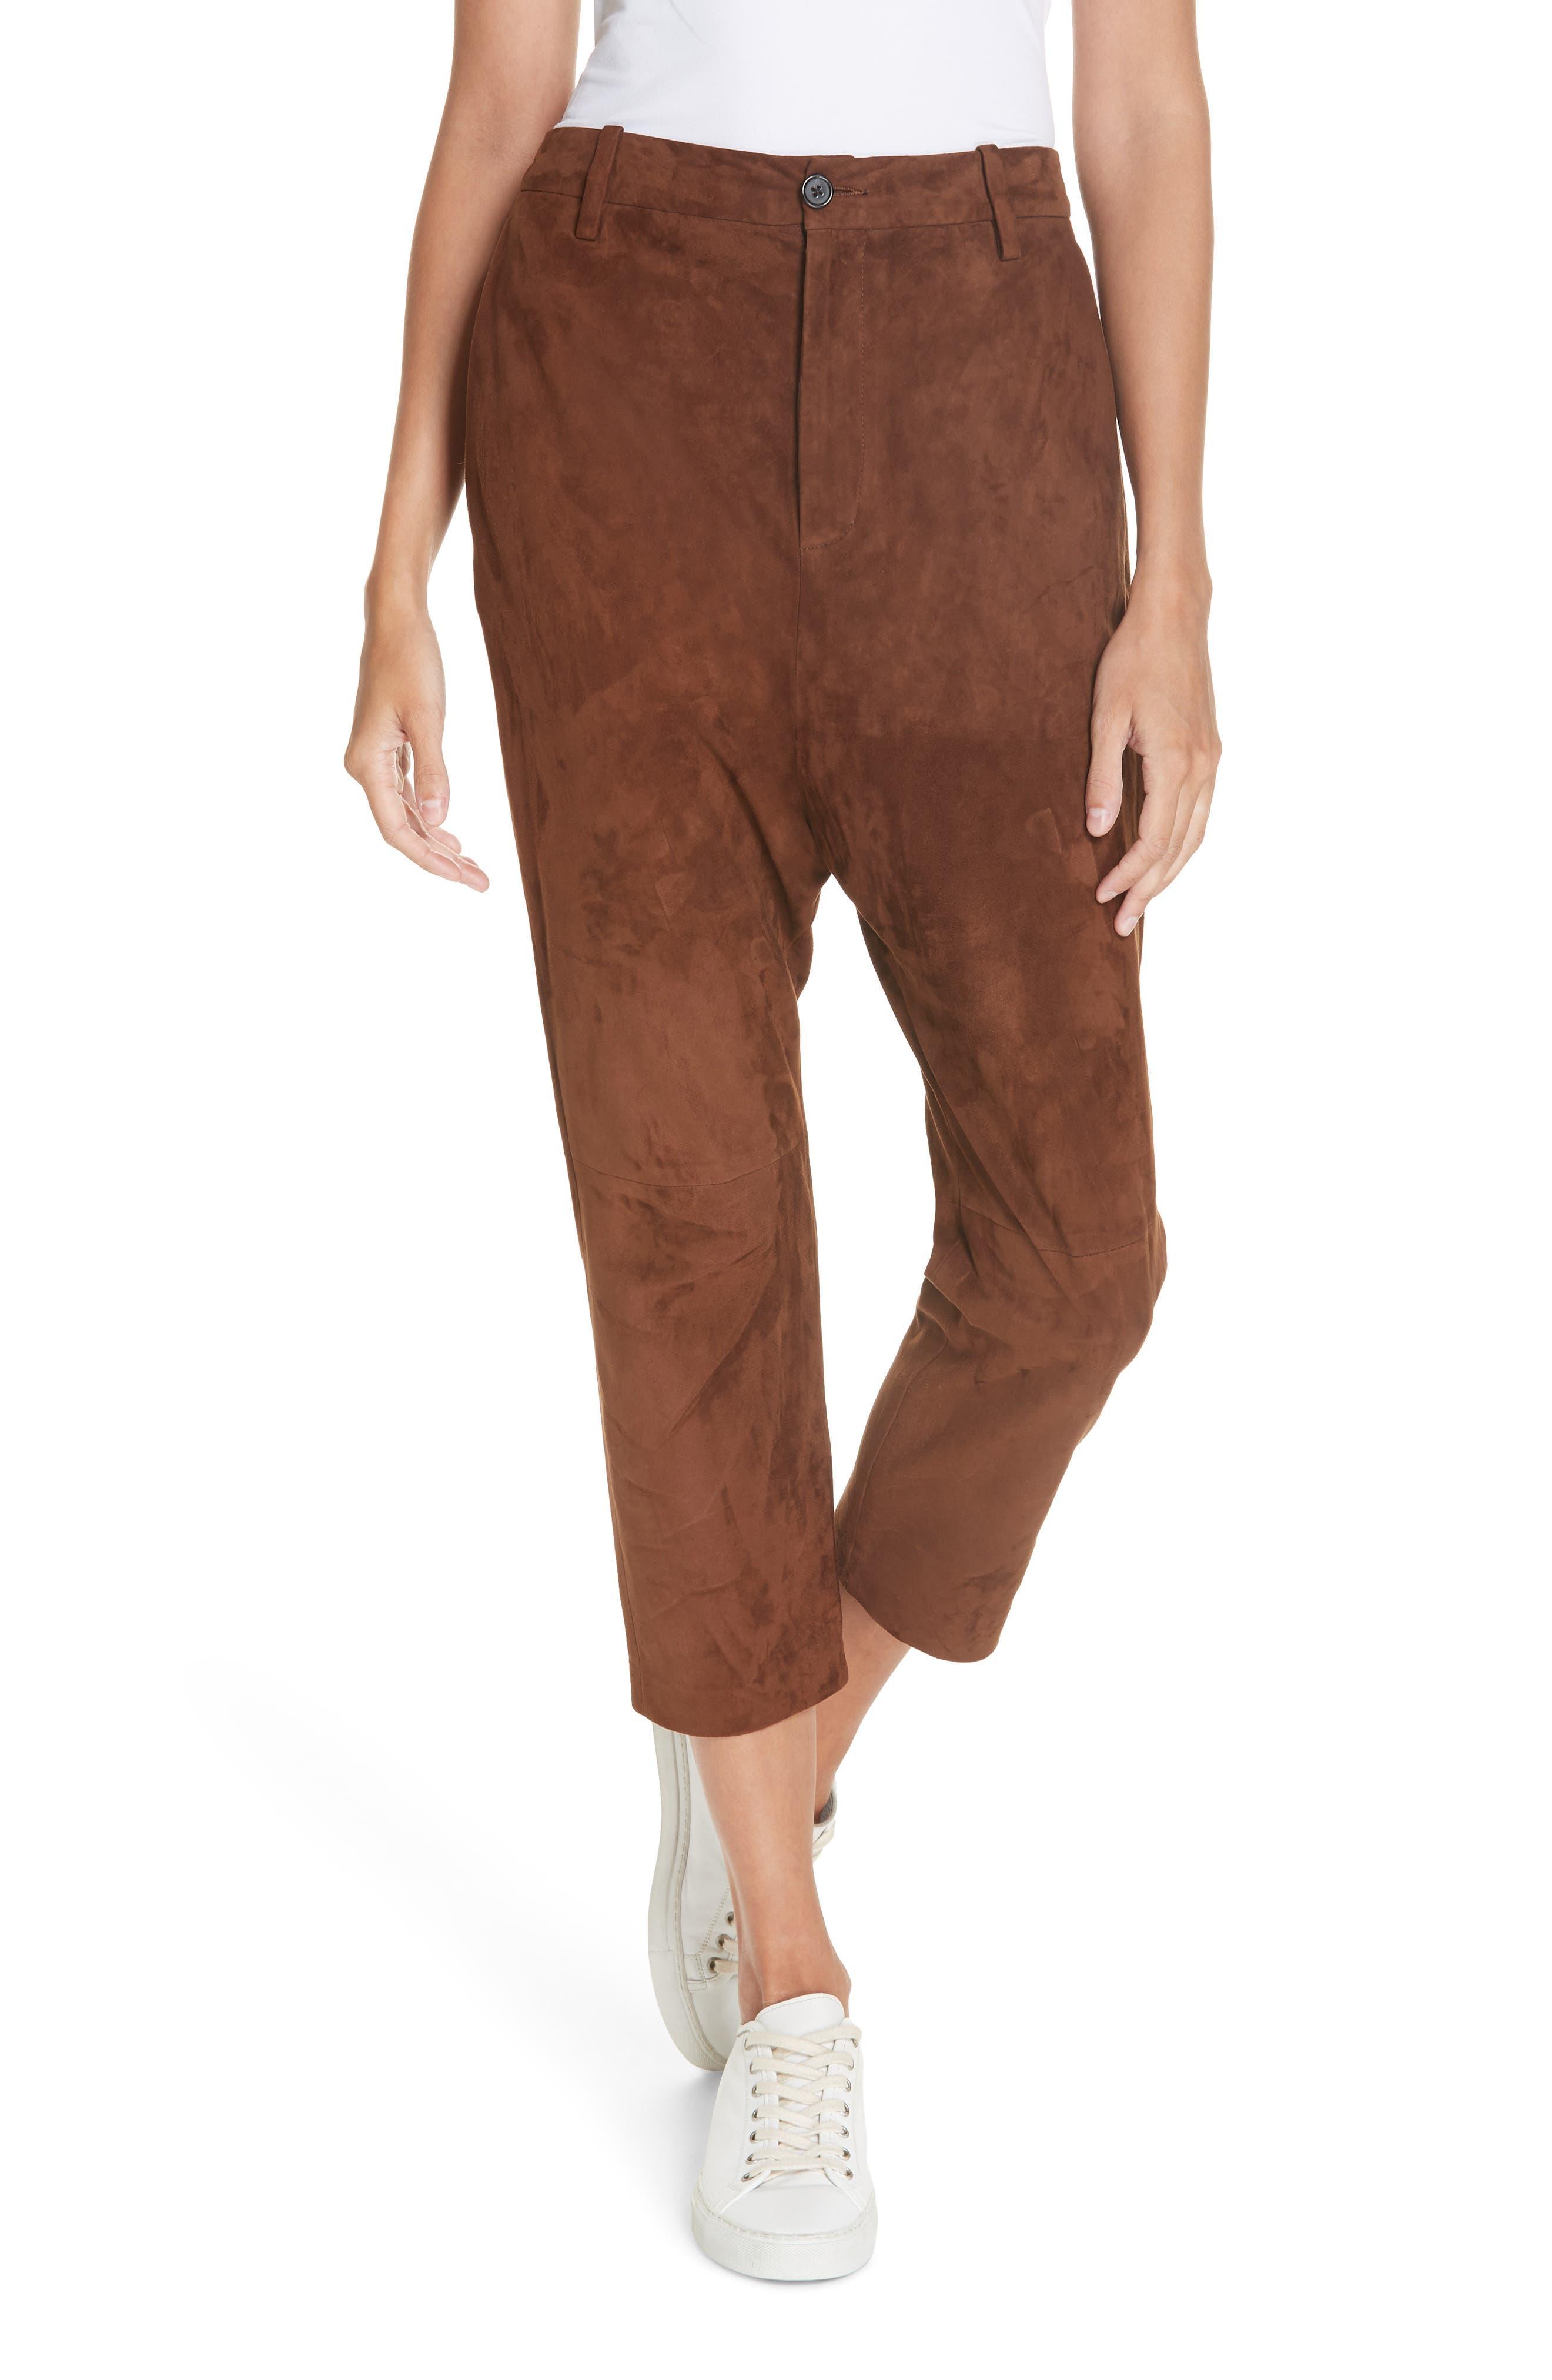 NILI LOTAN, Paris Leather Pants, Main thumbnail 1, color, DARK COGNAC